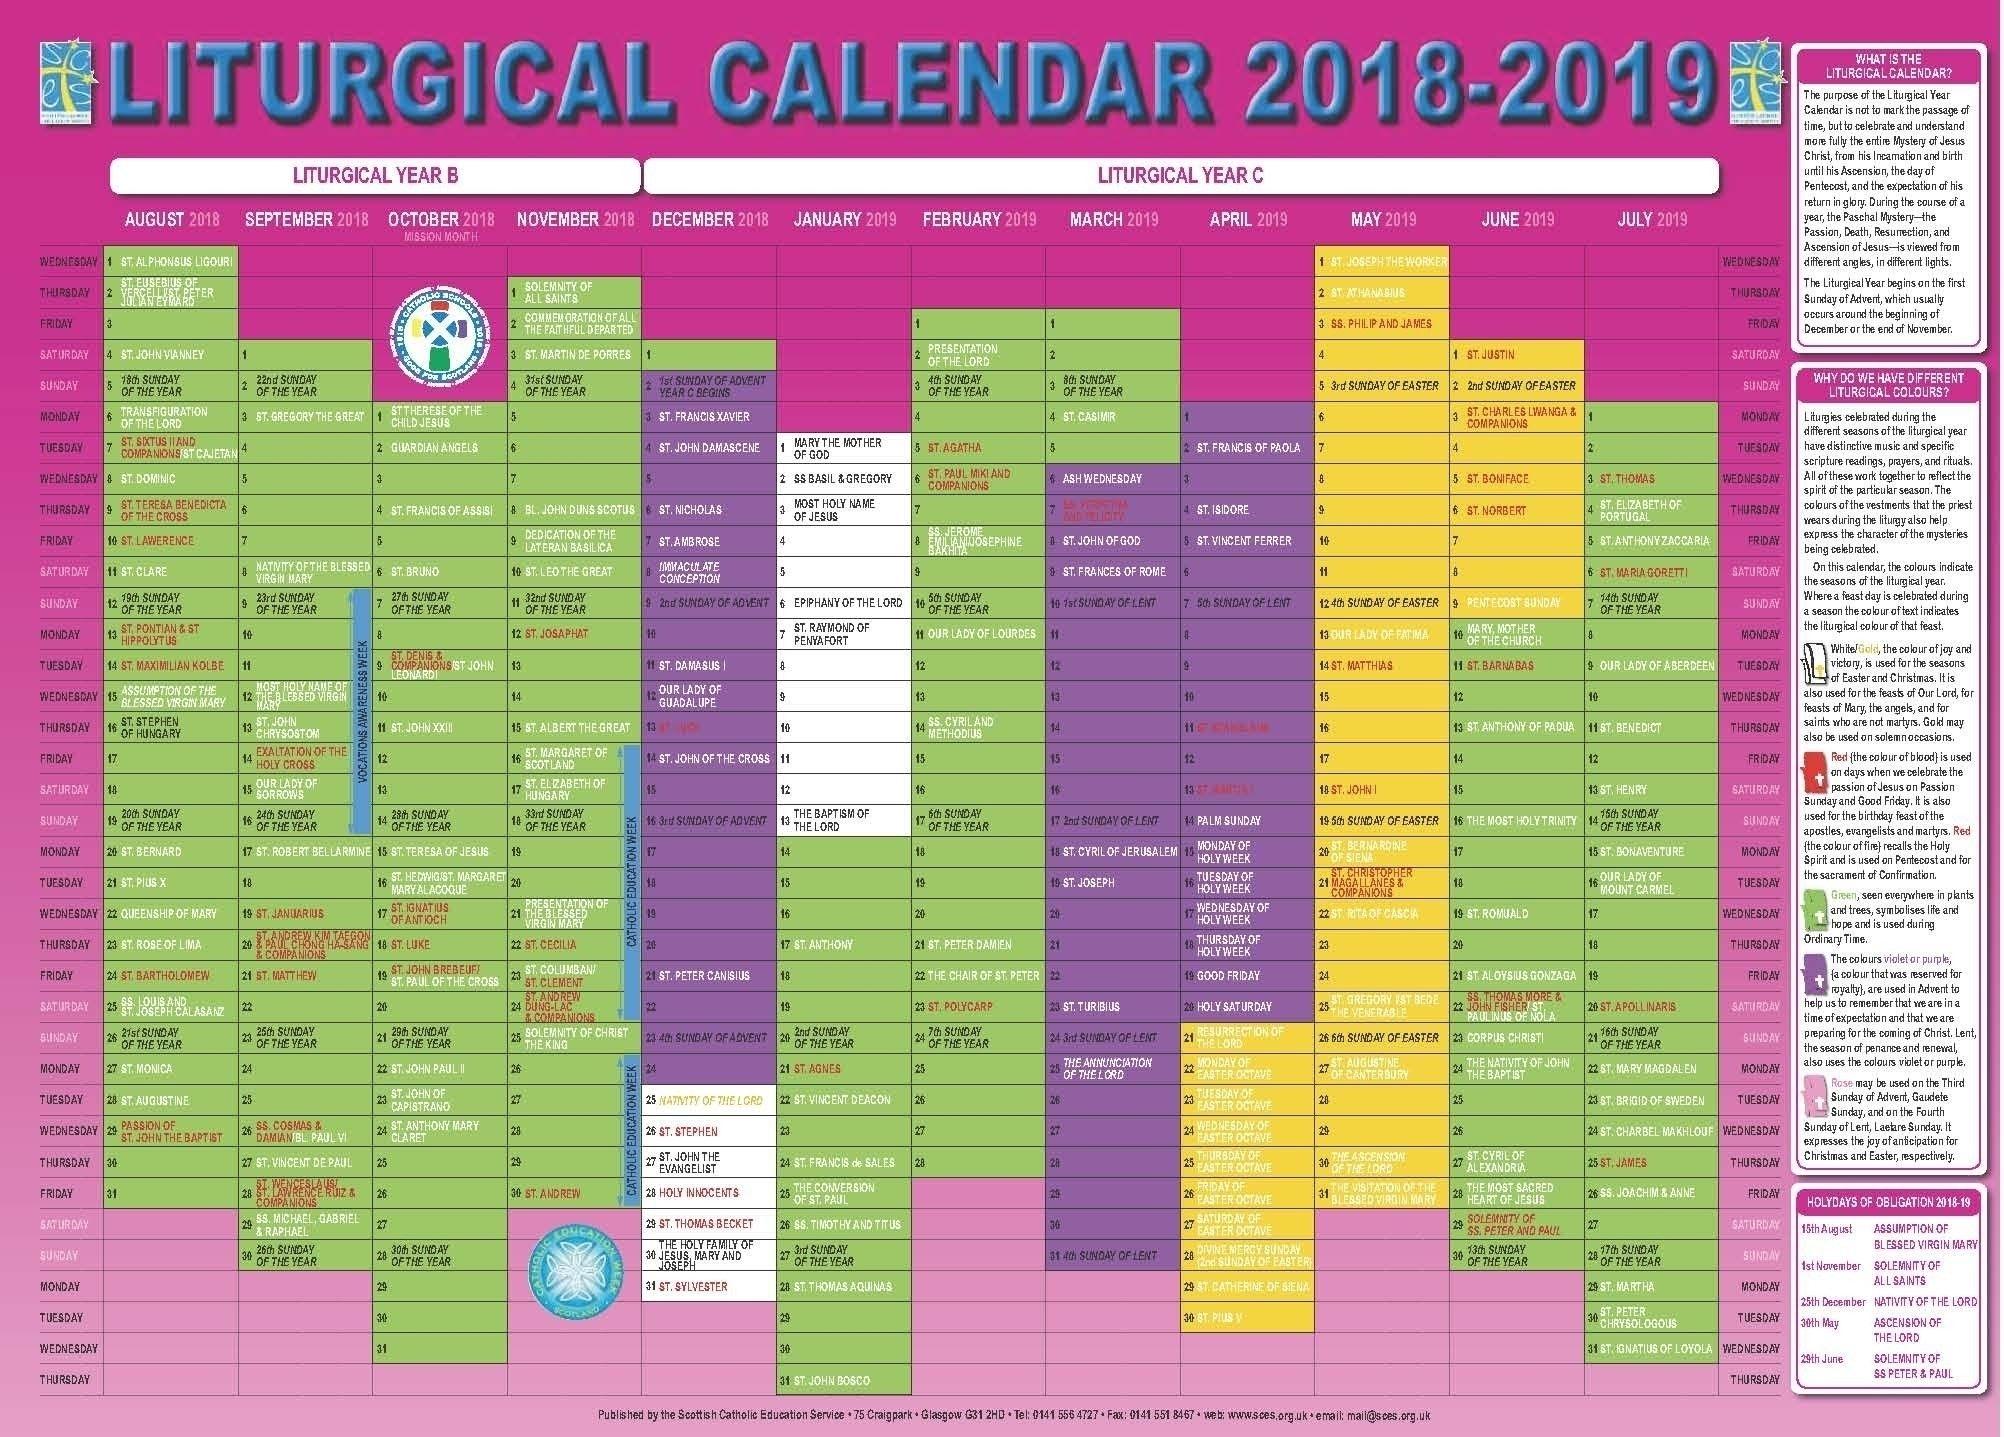 Free Printable Liturgical Calendar In 2020 | Catholic with regard to Catholic Calendar 2020 Printable Pdf